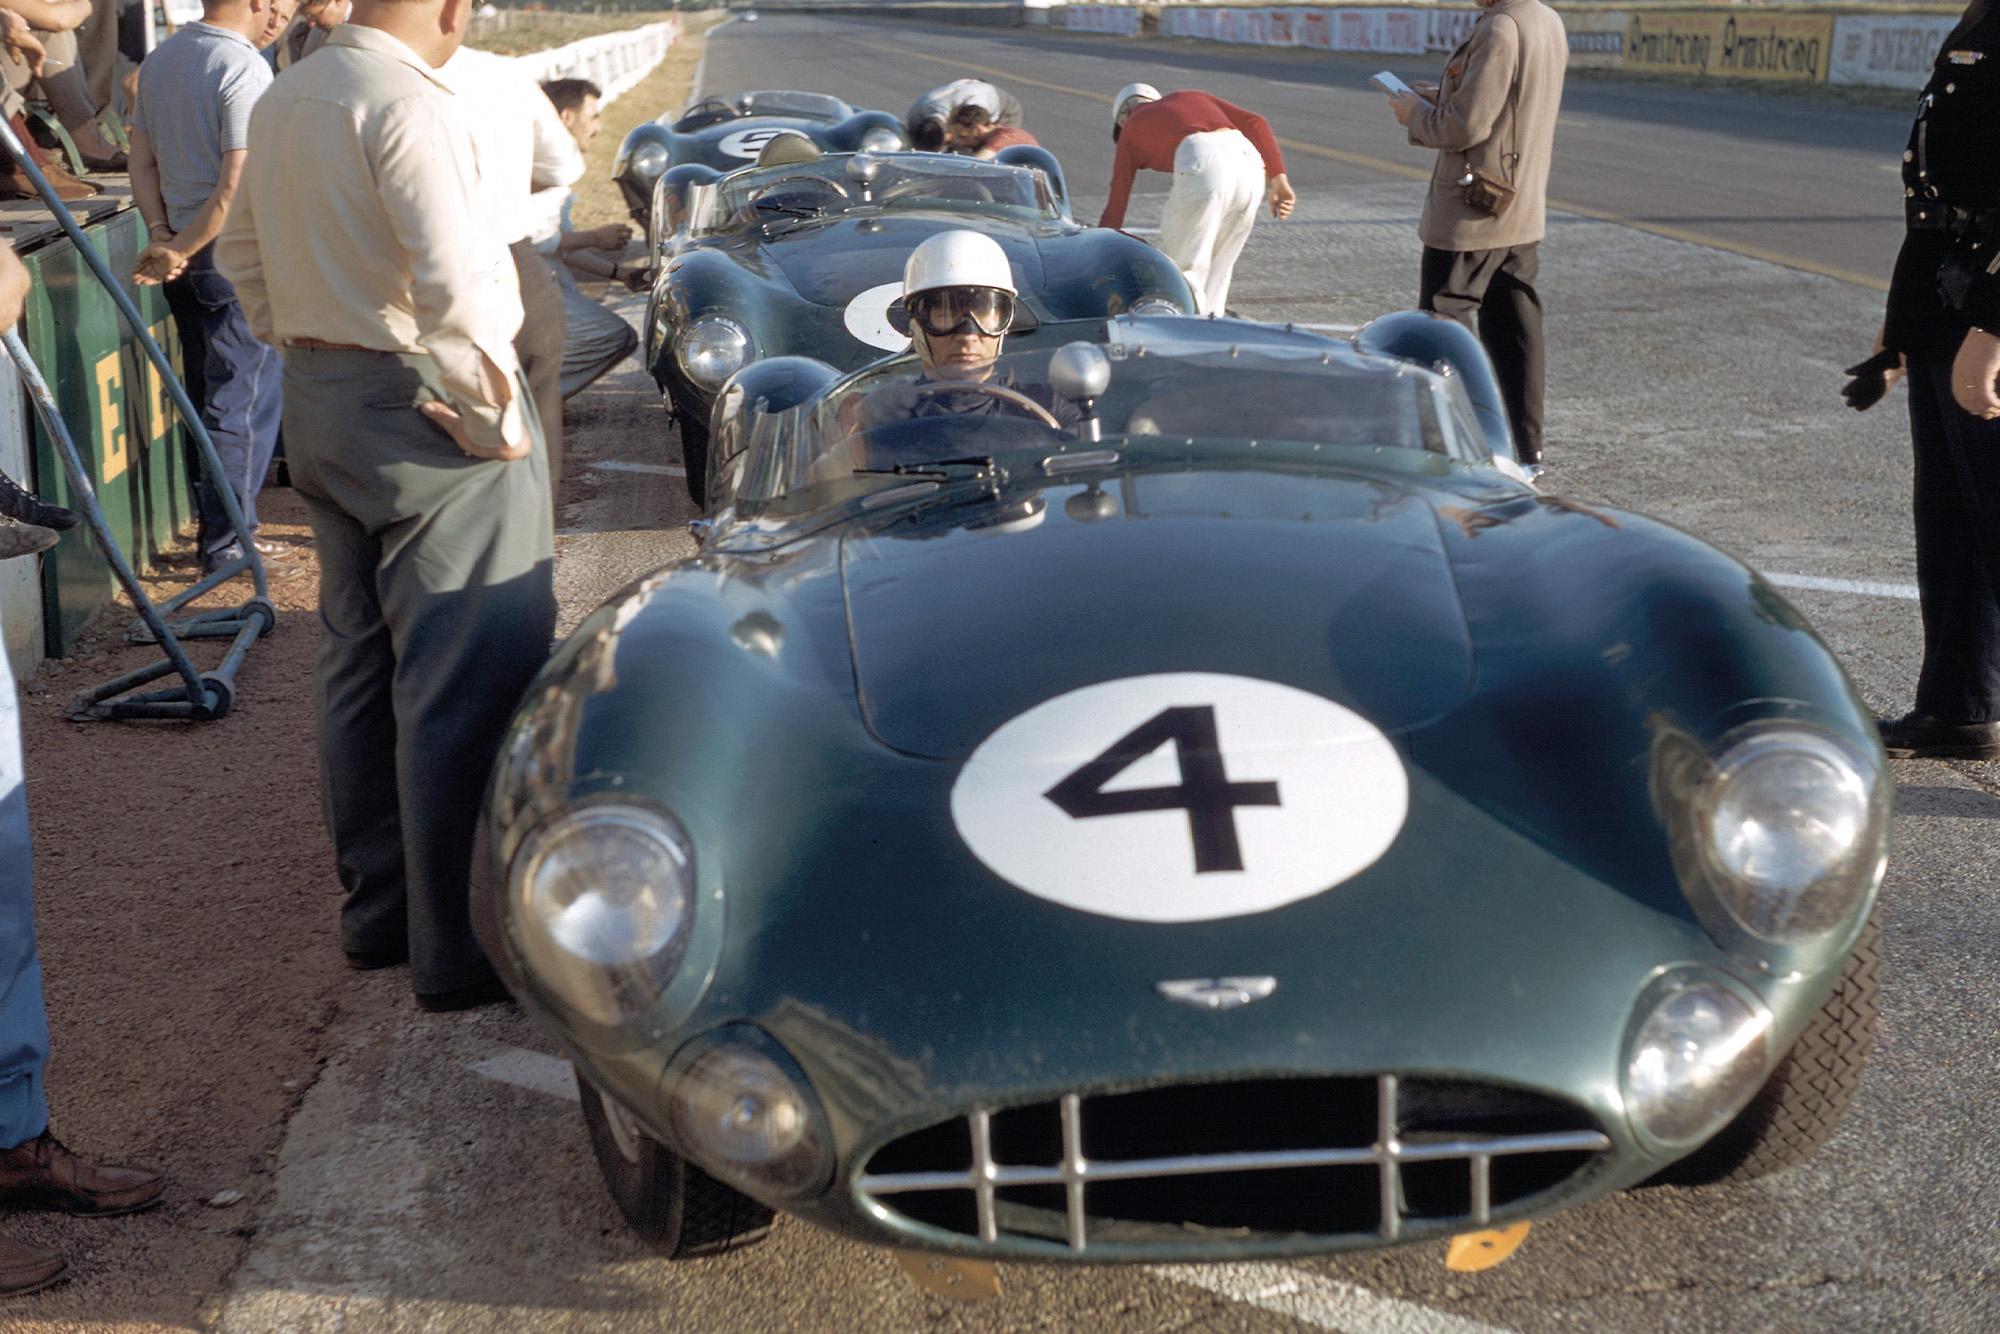 Stirling Moss in an Aston Martin DBR1